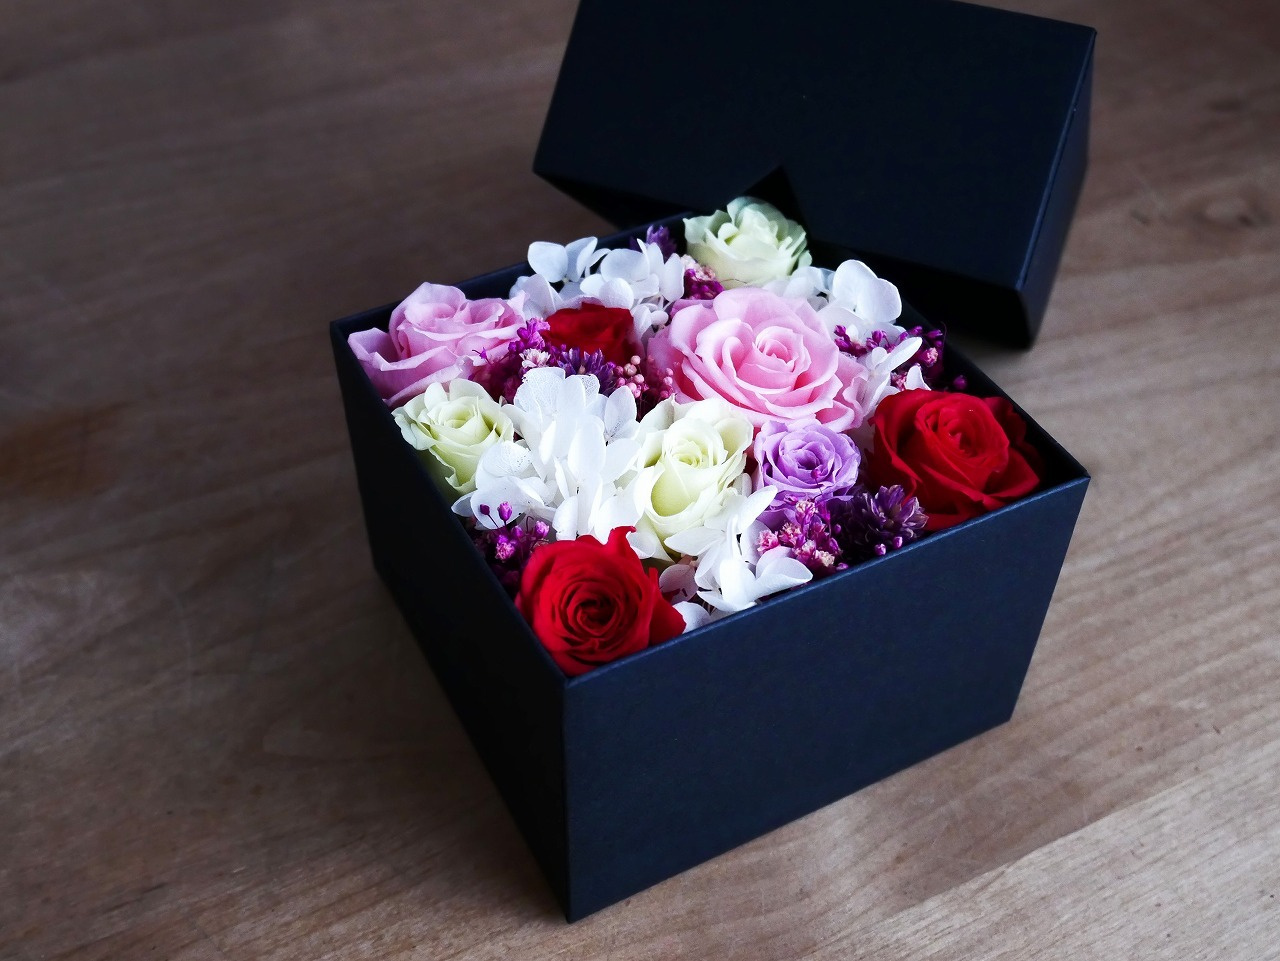 Boxed preserved flower arrangement*Pink S(フラワーボックスS:プリザーブドフラワー*ピンク)